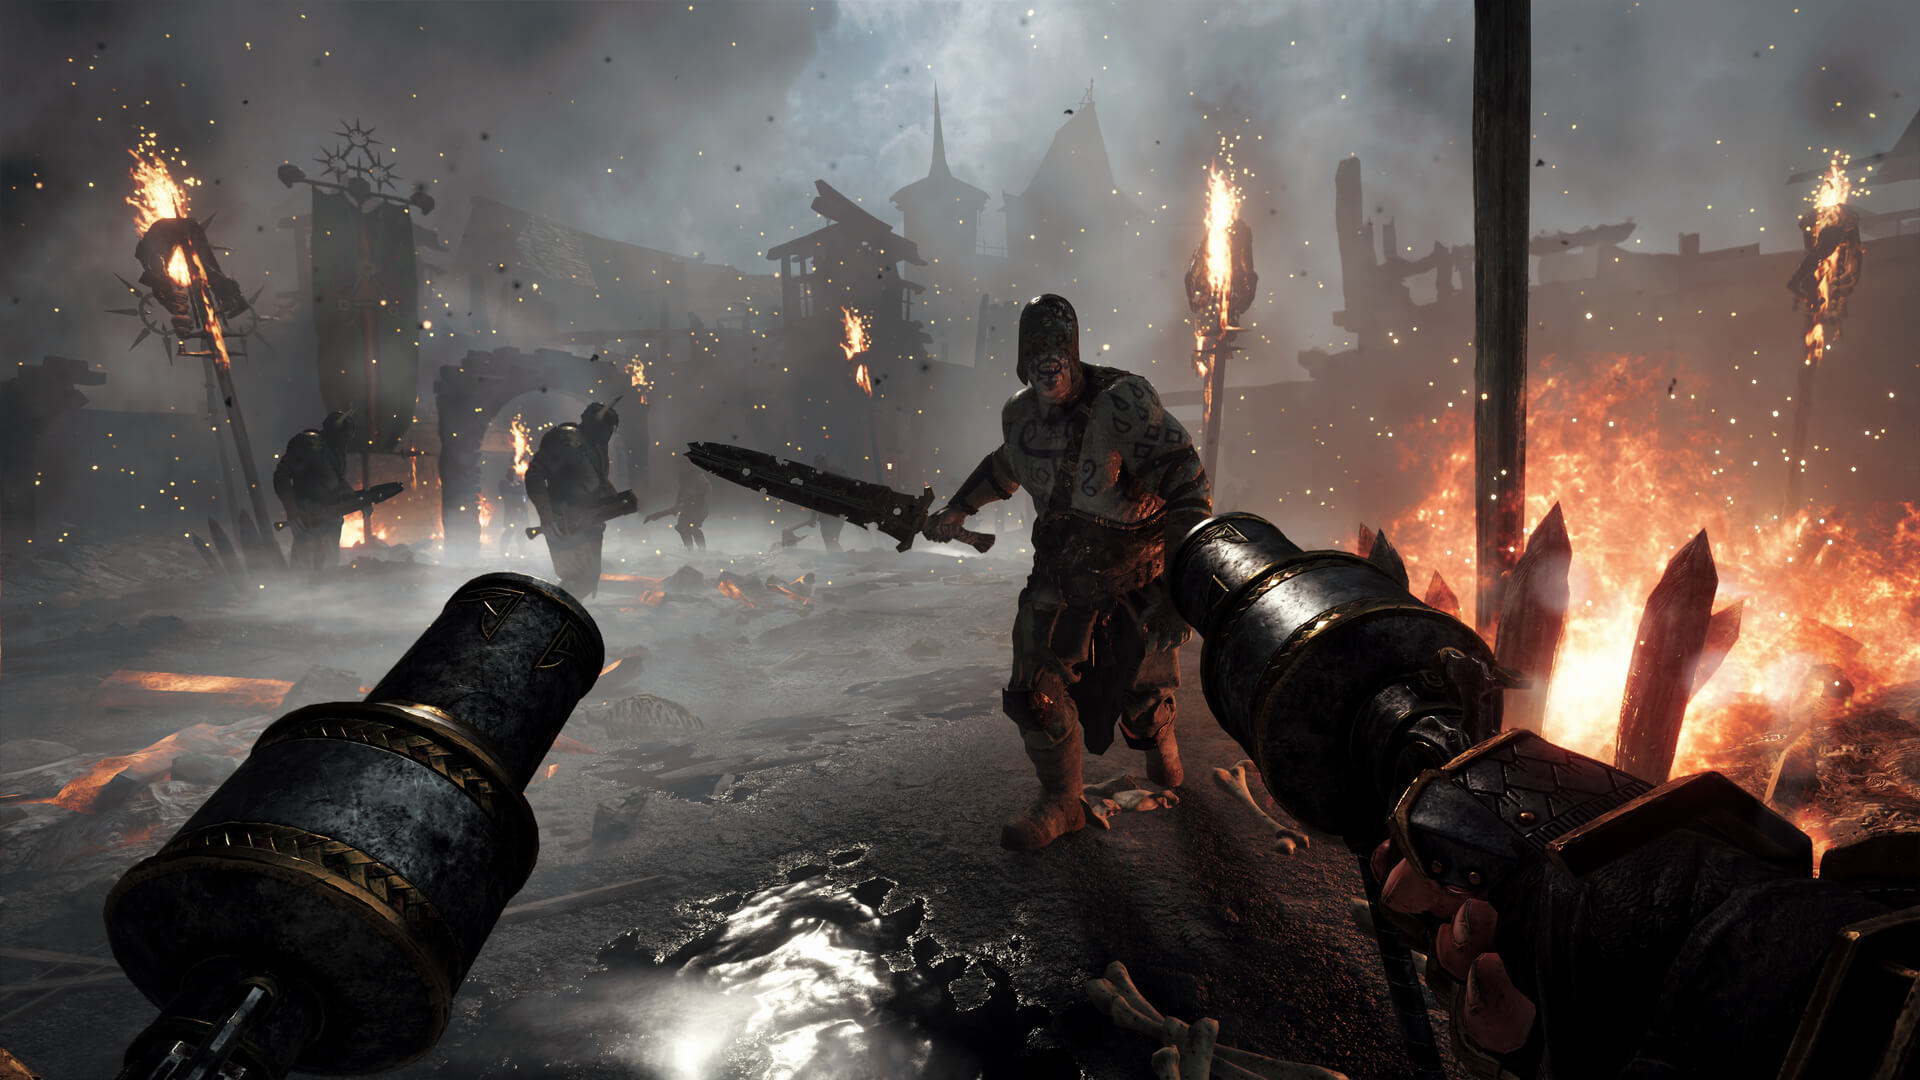 Warhammer: Vermintide 2 has sold two million copies worldwide